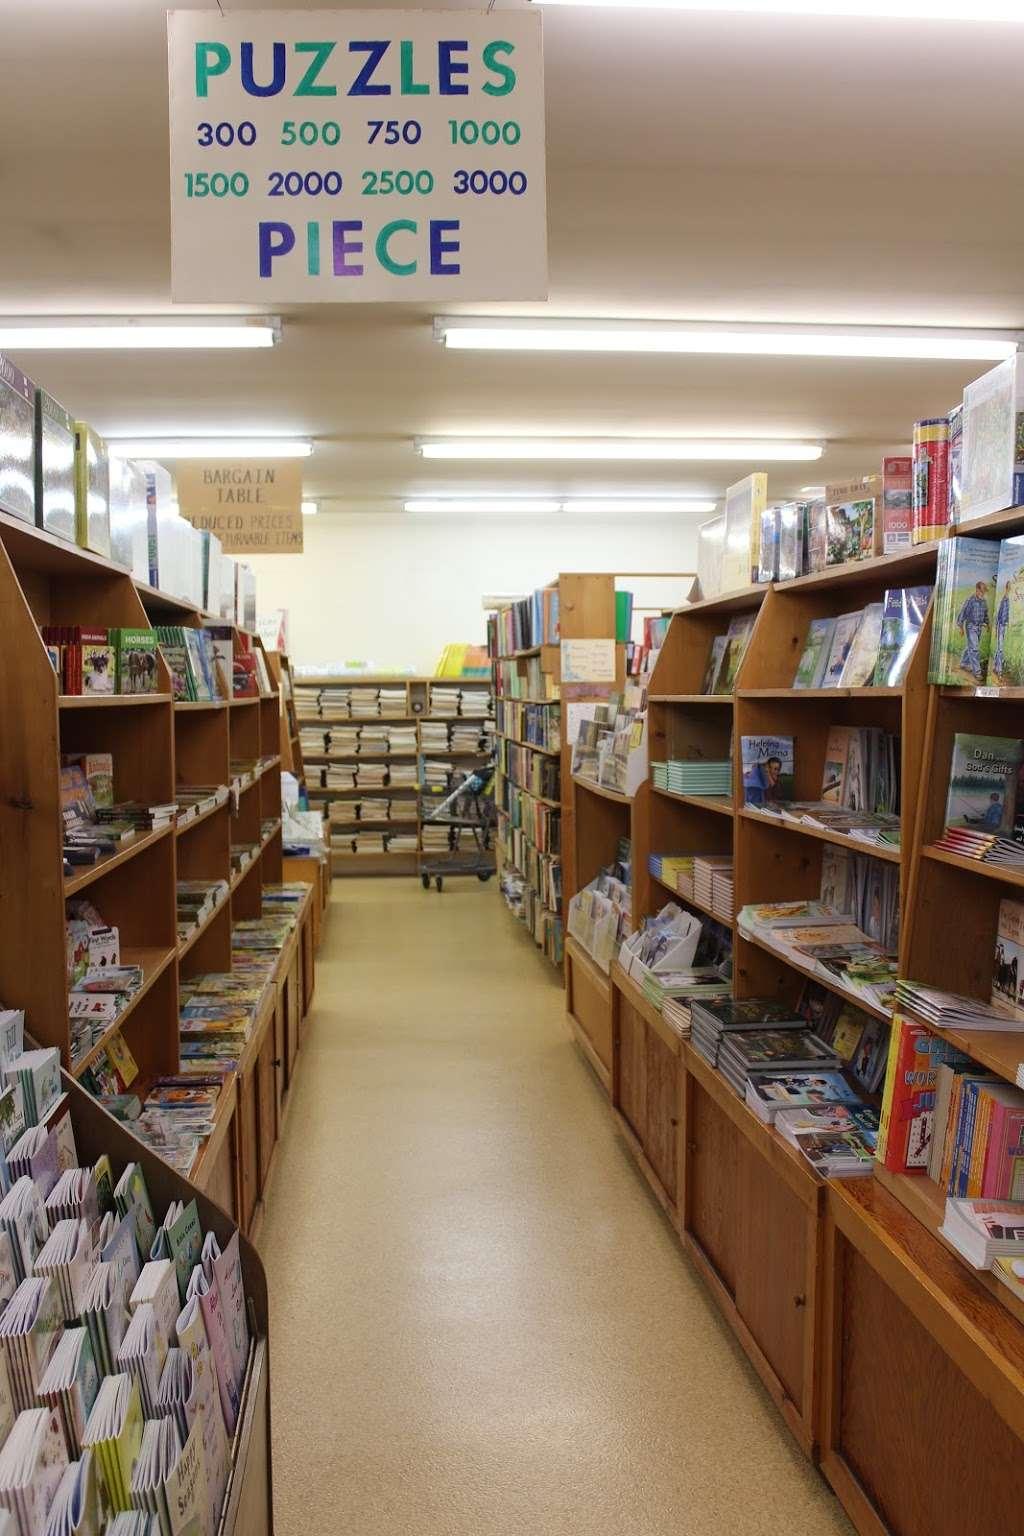 Clay Book Store - book store  | Photo 1 of 10 | Address: 2450 W Main St, Ephrata, PA 17522, USA | Phone: (717) 733-7253